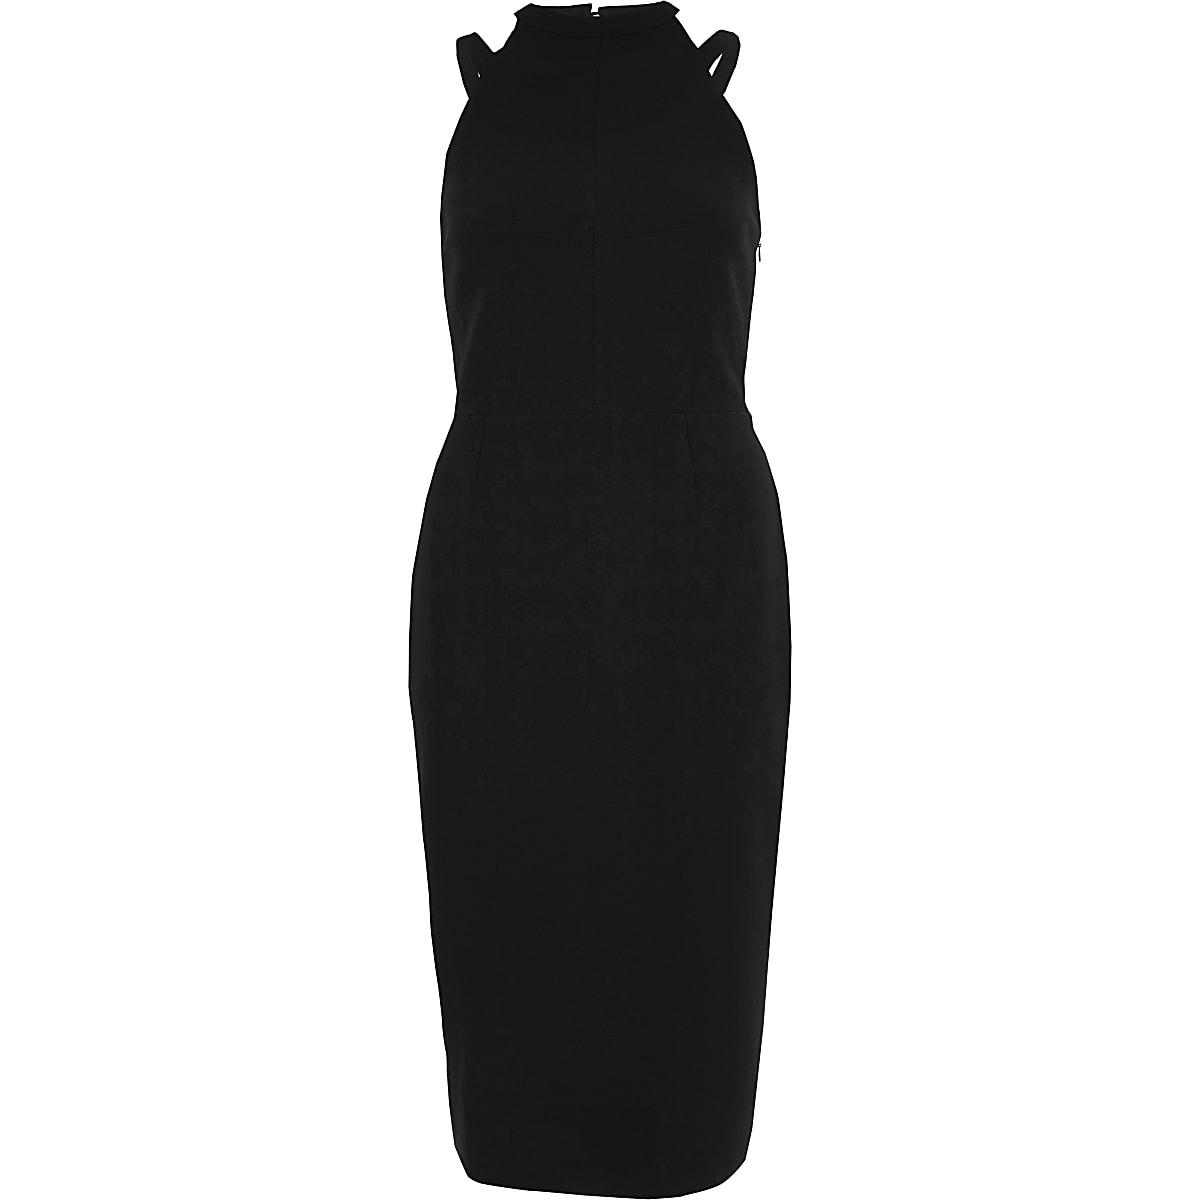 57e19a56f40119 Black sleeveless high neck bodycon dress - Bodycon Dresses - Dresses - women